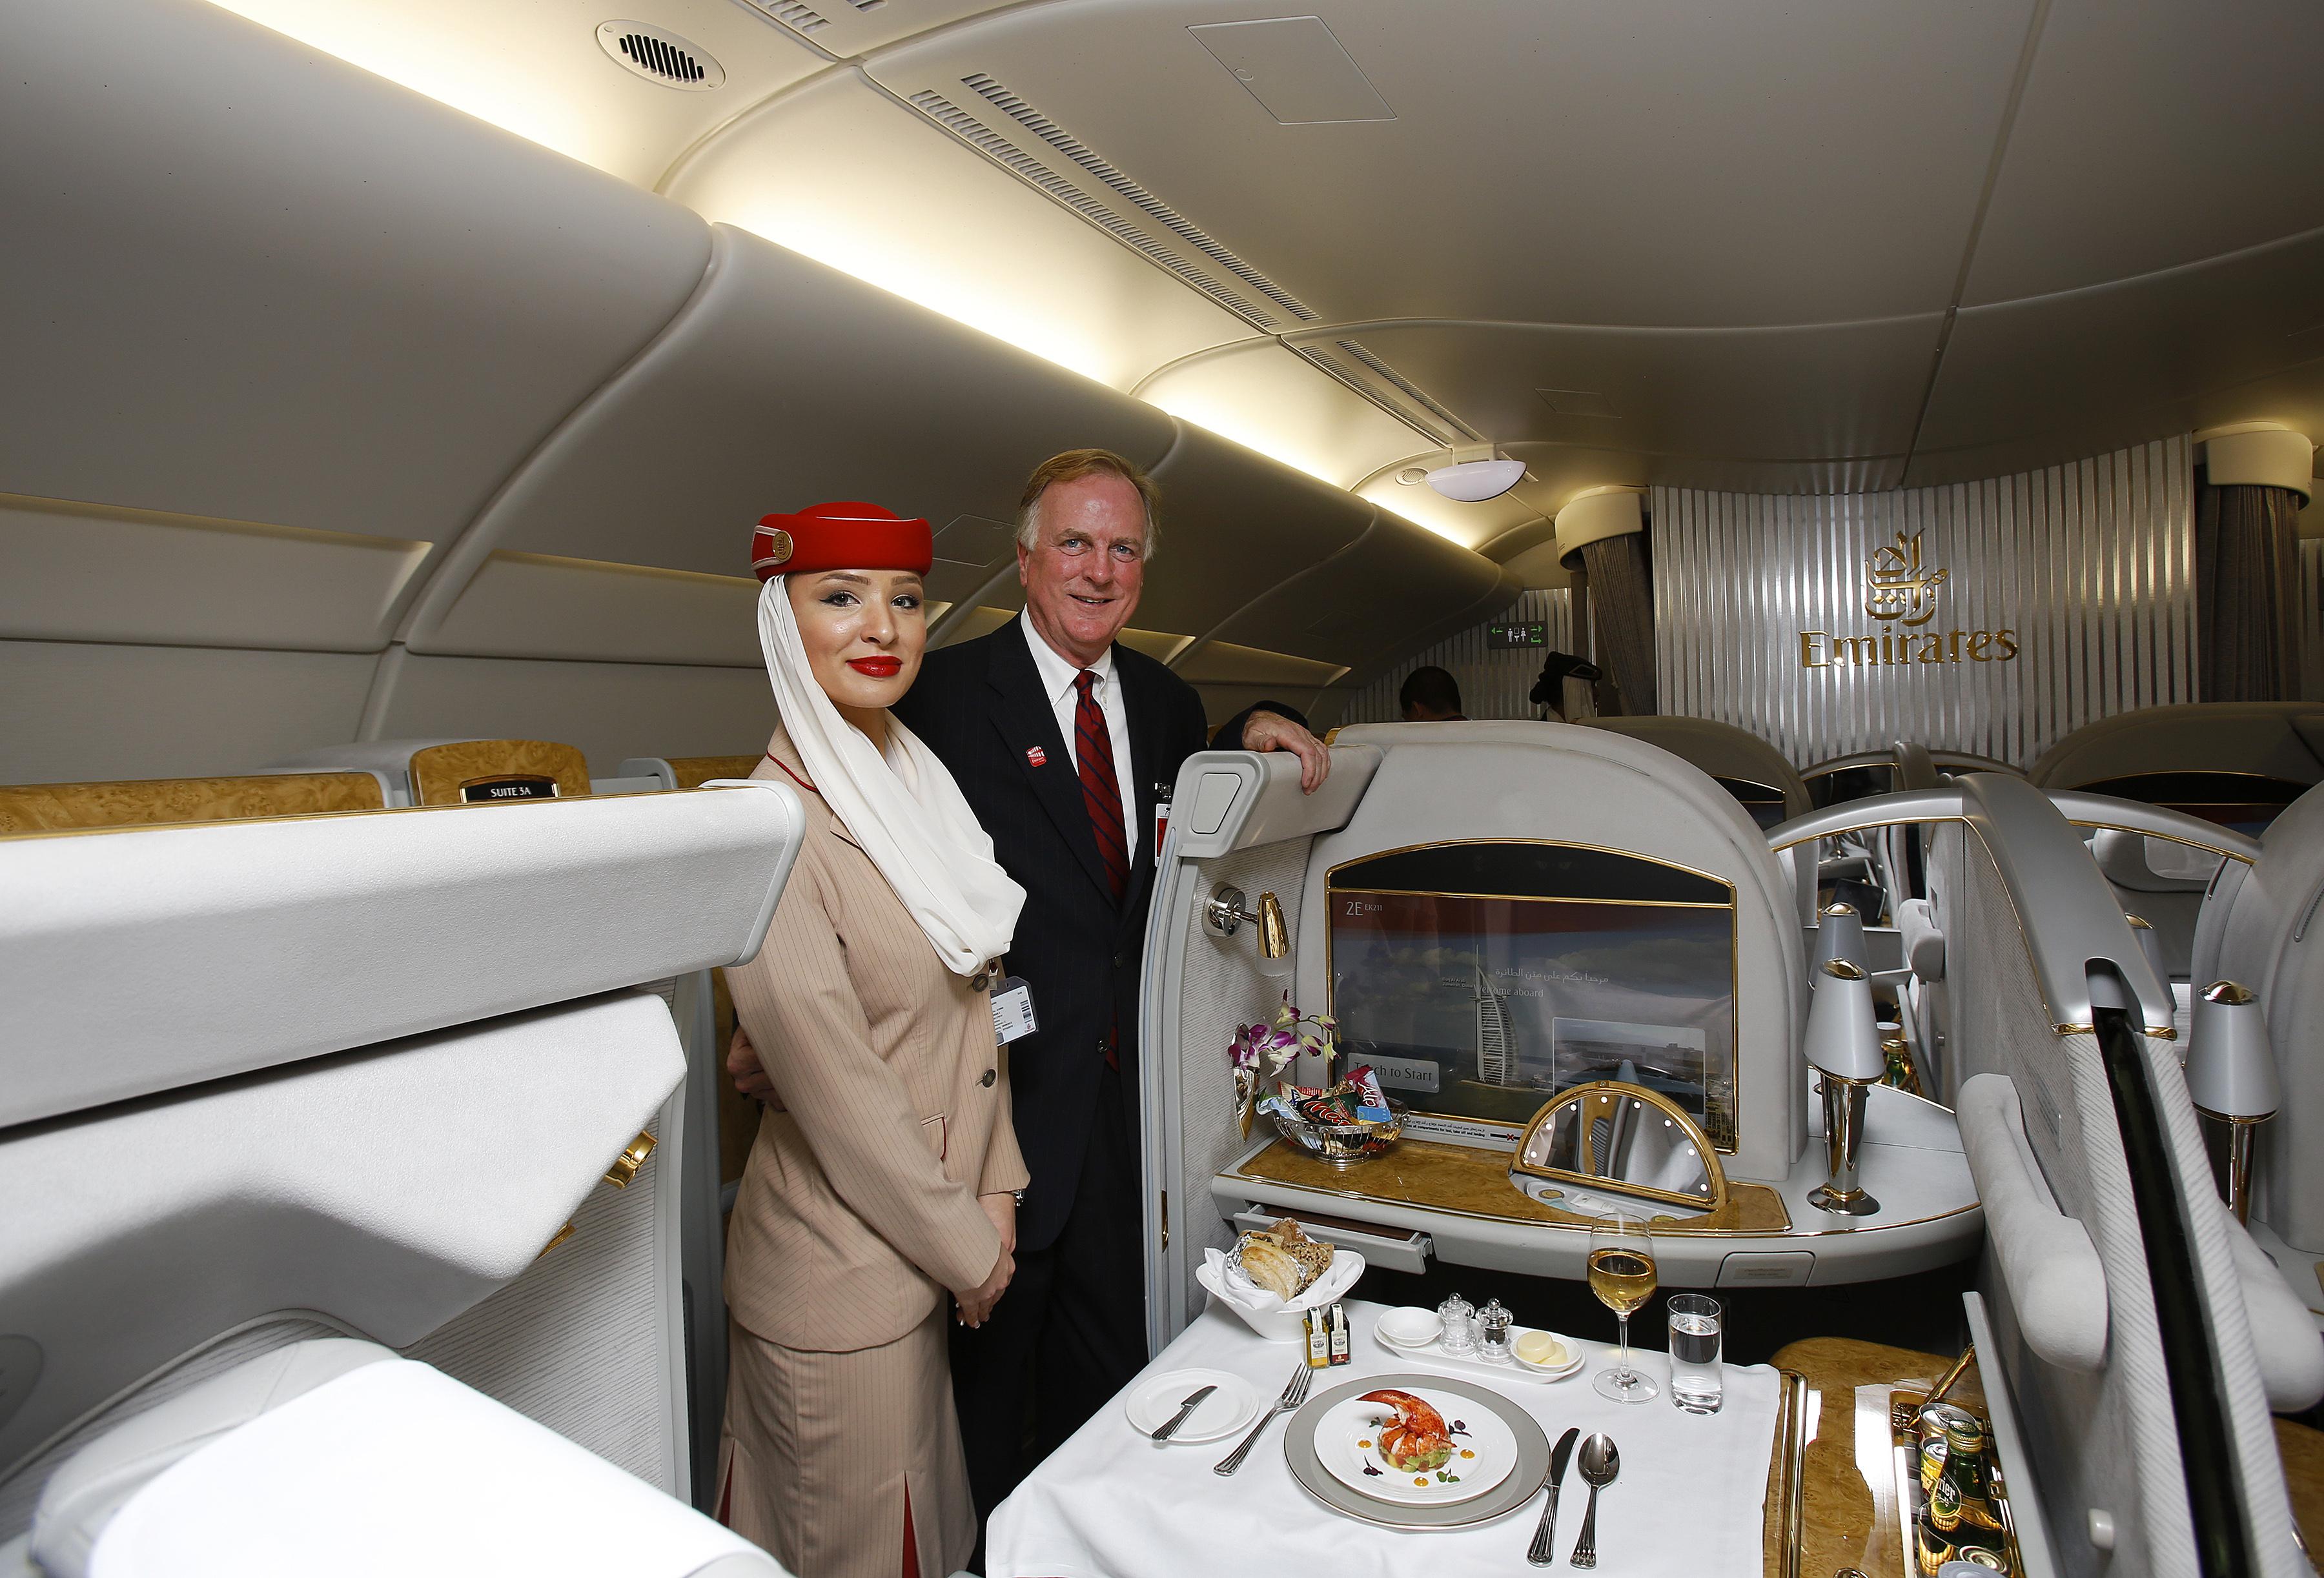 leka gajula global aviation leader increases capacity on its ...